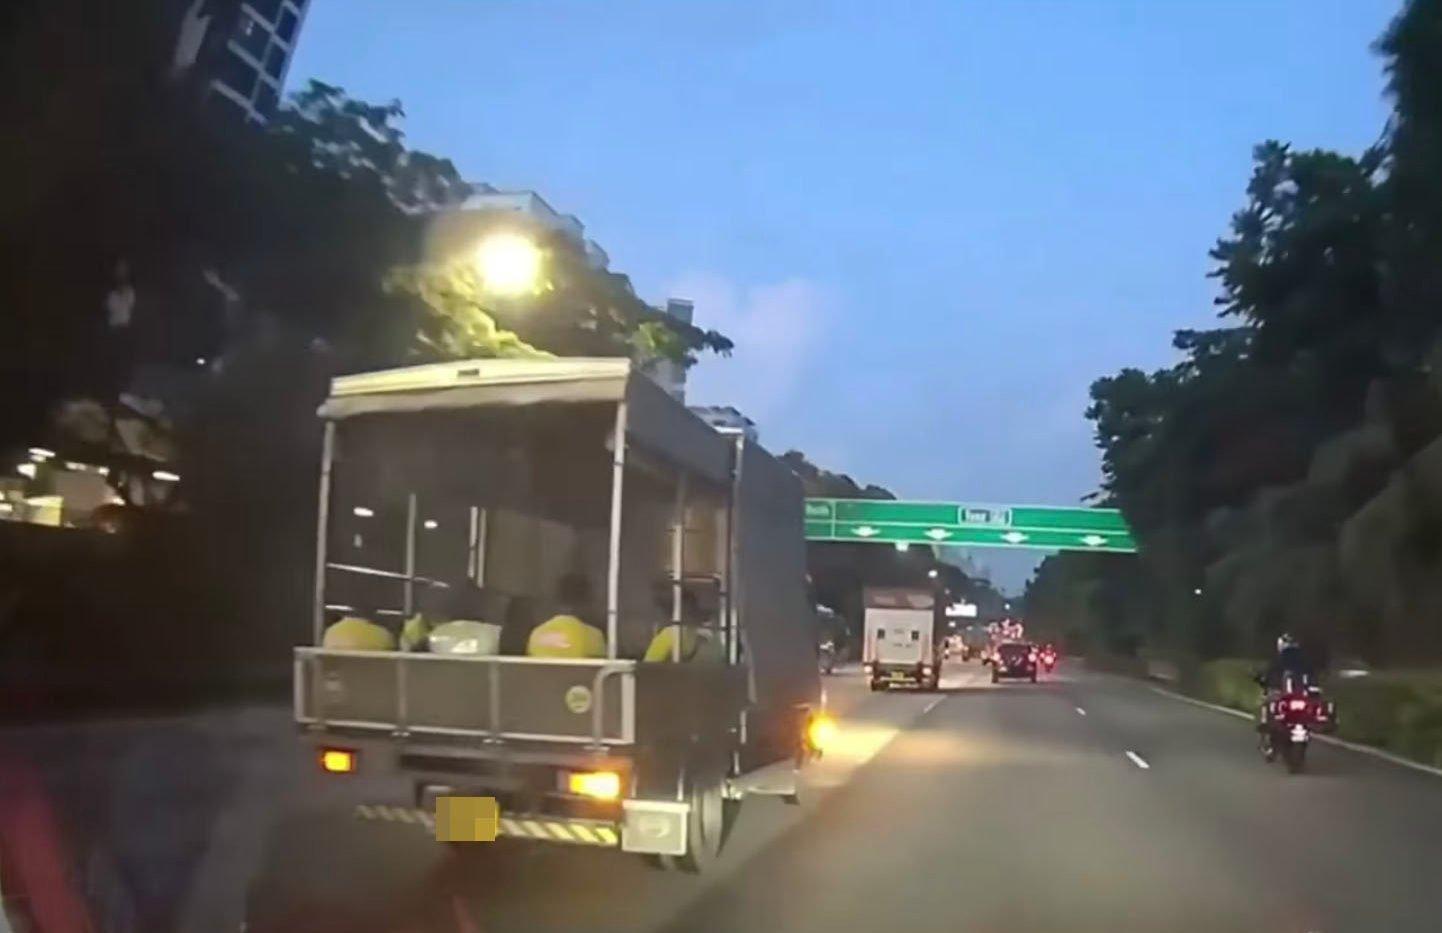 lorry workers speeding